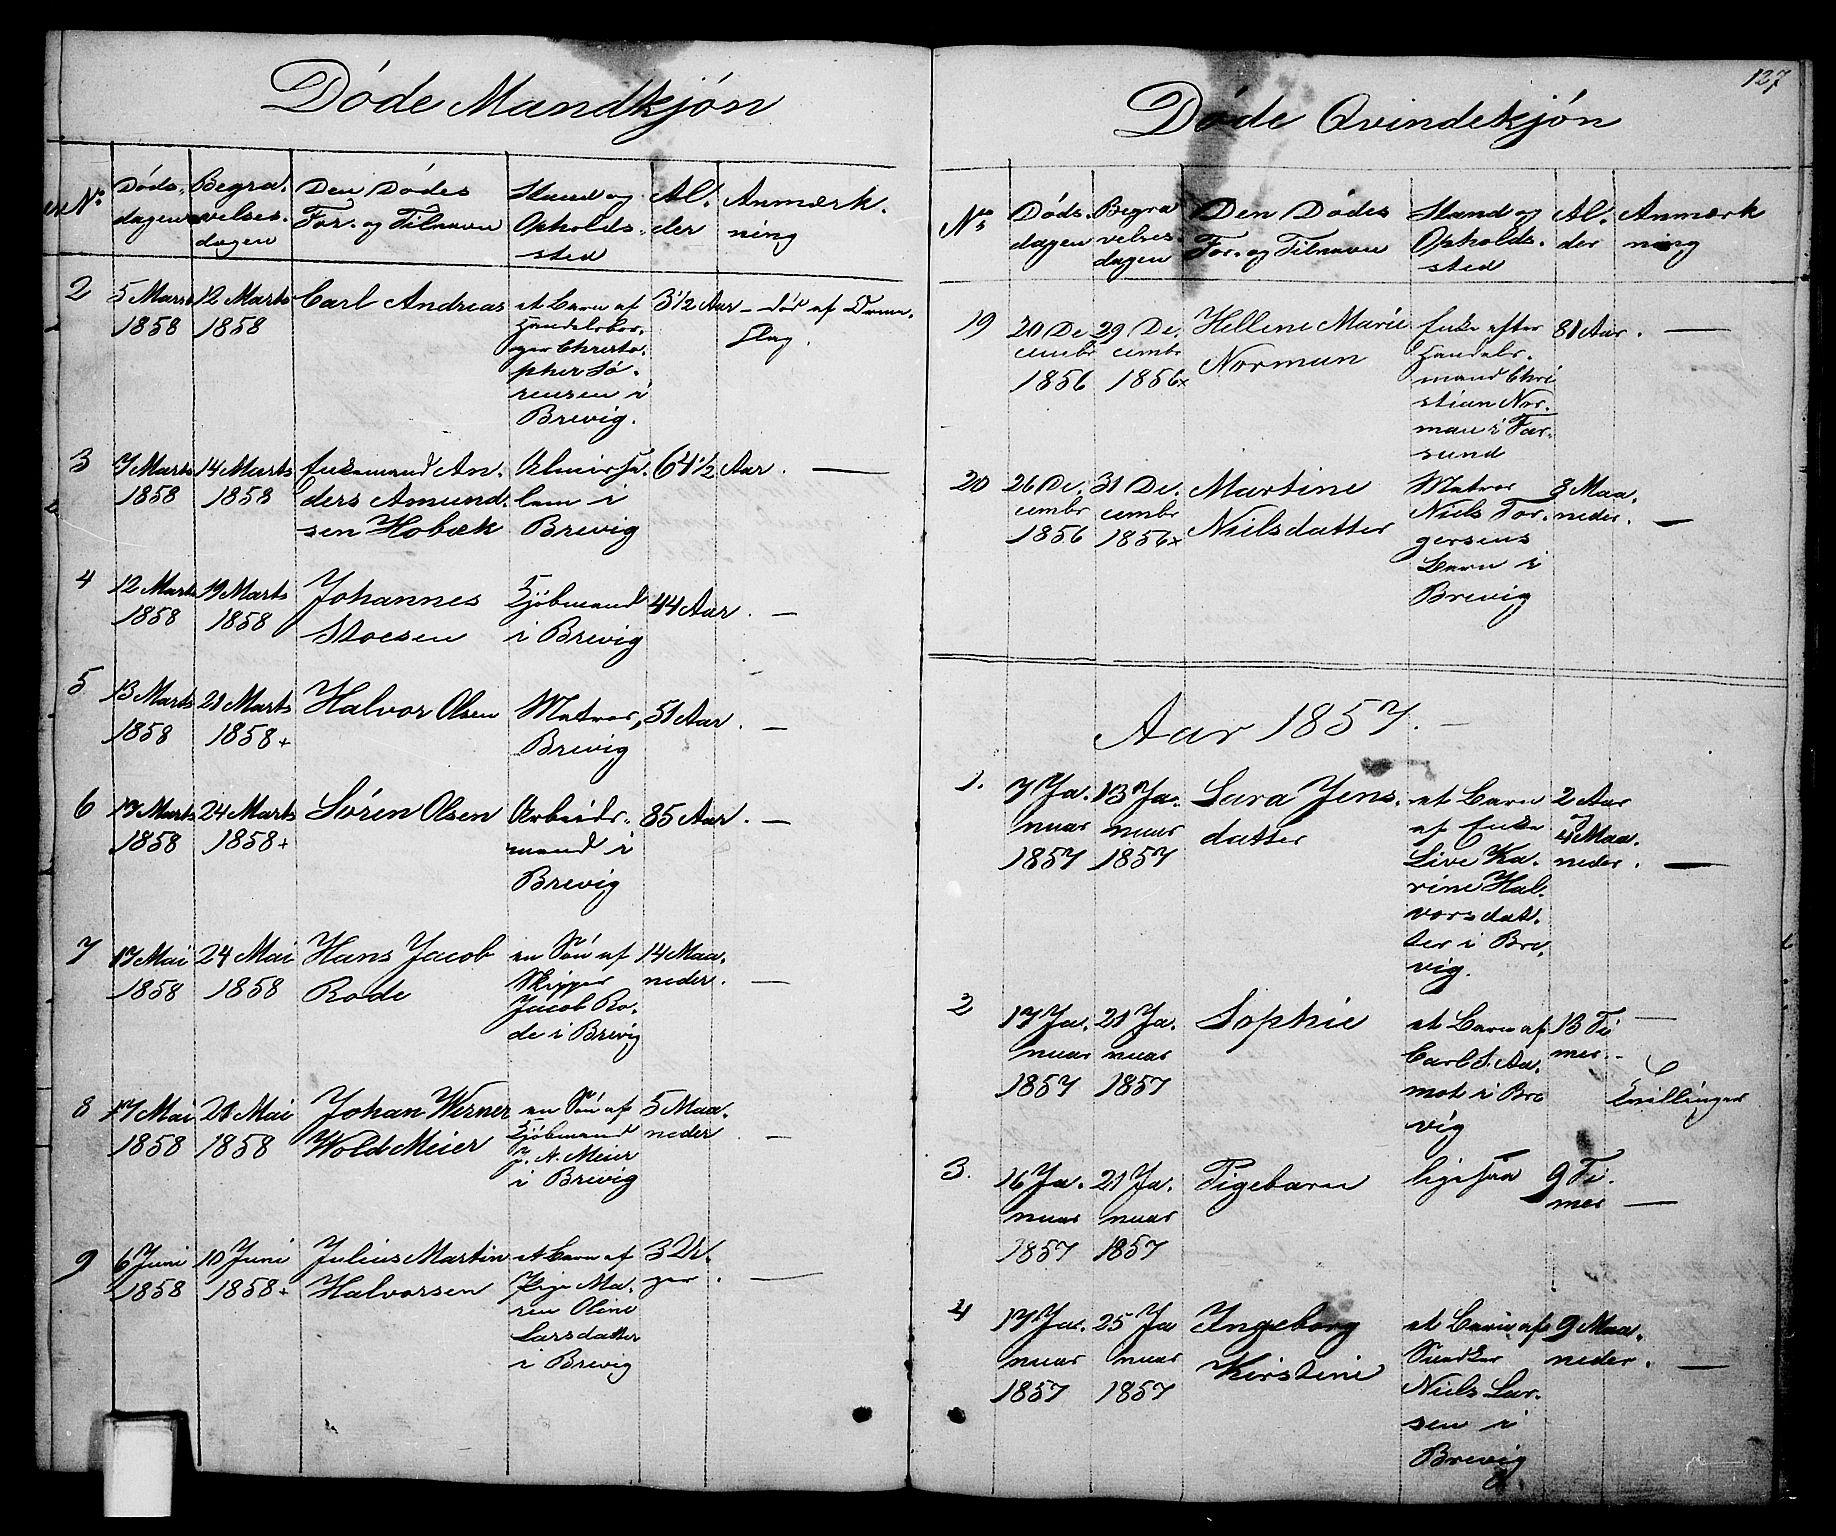 SAKO, Brevik kirkebøker, G/Ga/L0002: Klokkerbok nr. 2, 1846-1865, s. 127